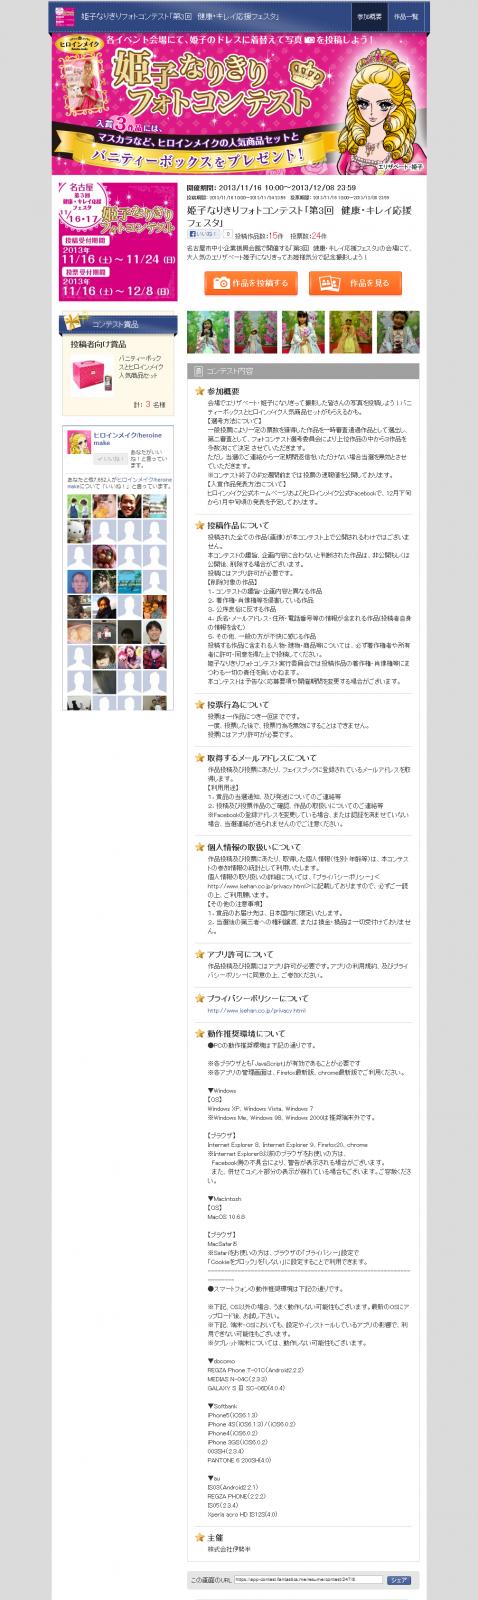 Fantastics 投稿&投票コンテスト(株式会社伊勢半様)